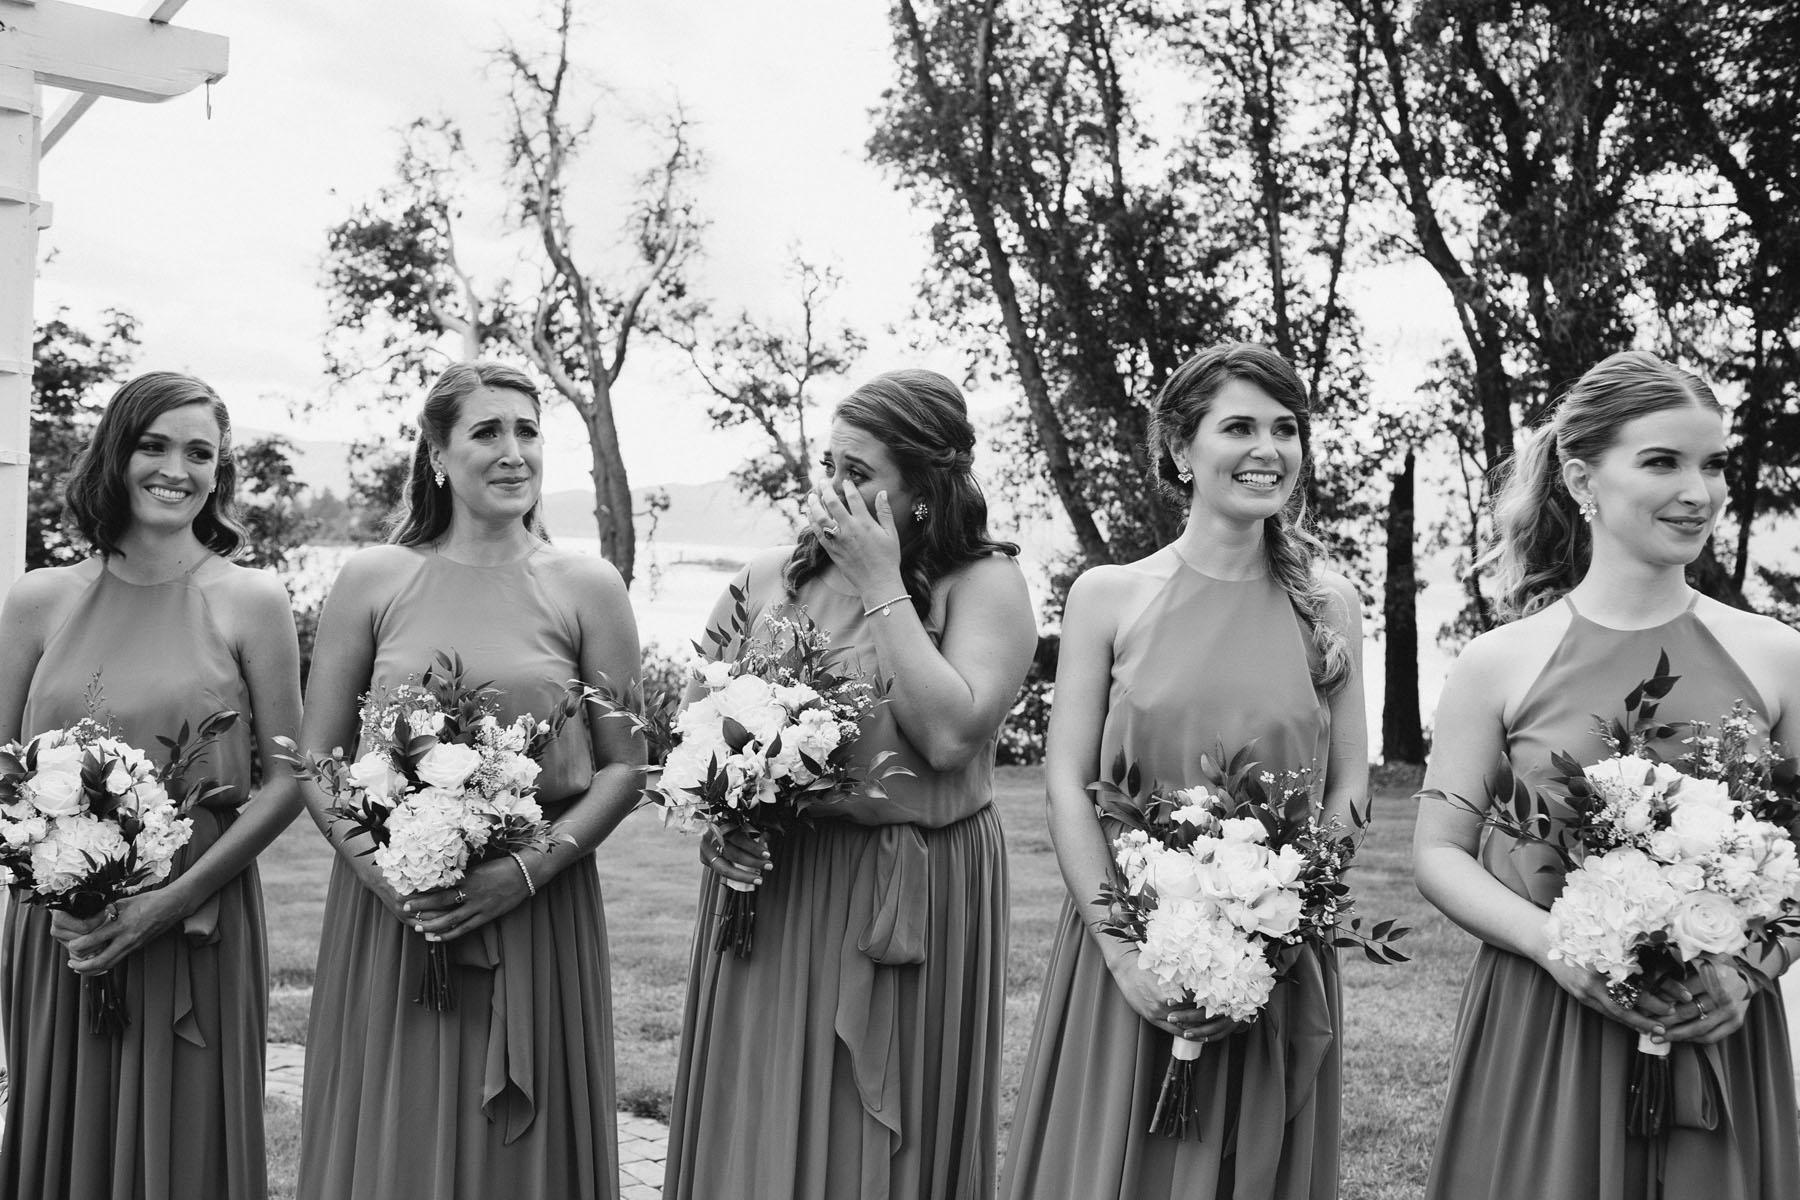 thetis-island-wedding-photographer-rp-rn-077.jpg